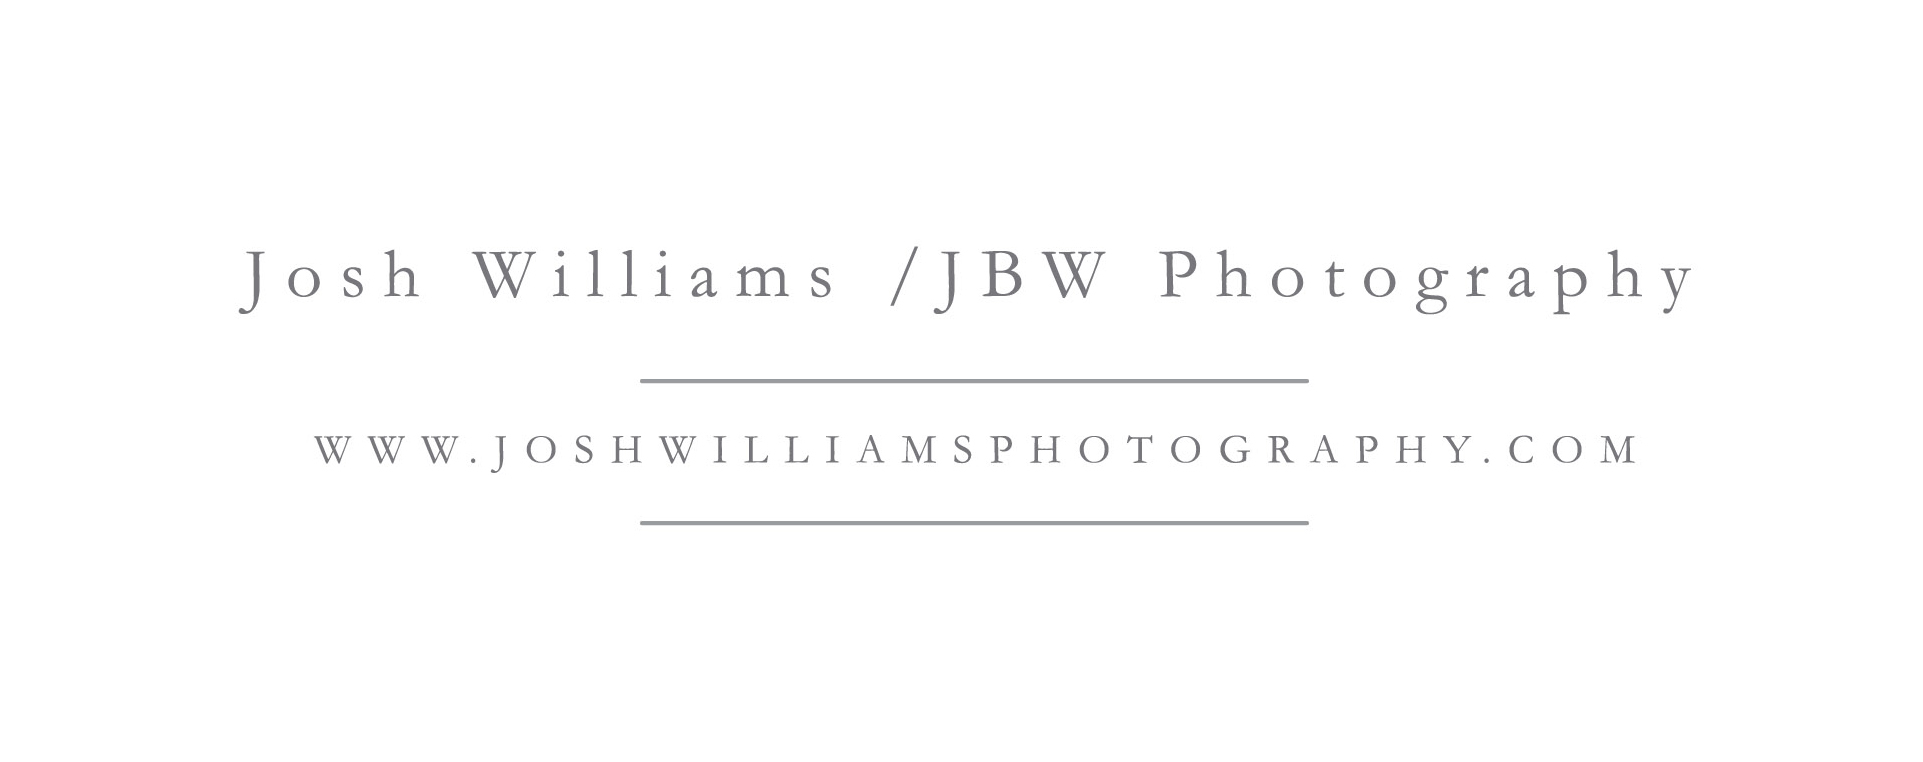 JBW Photography